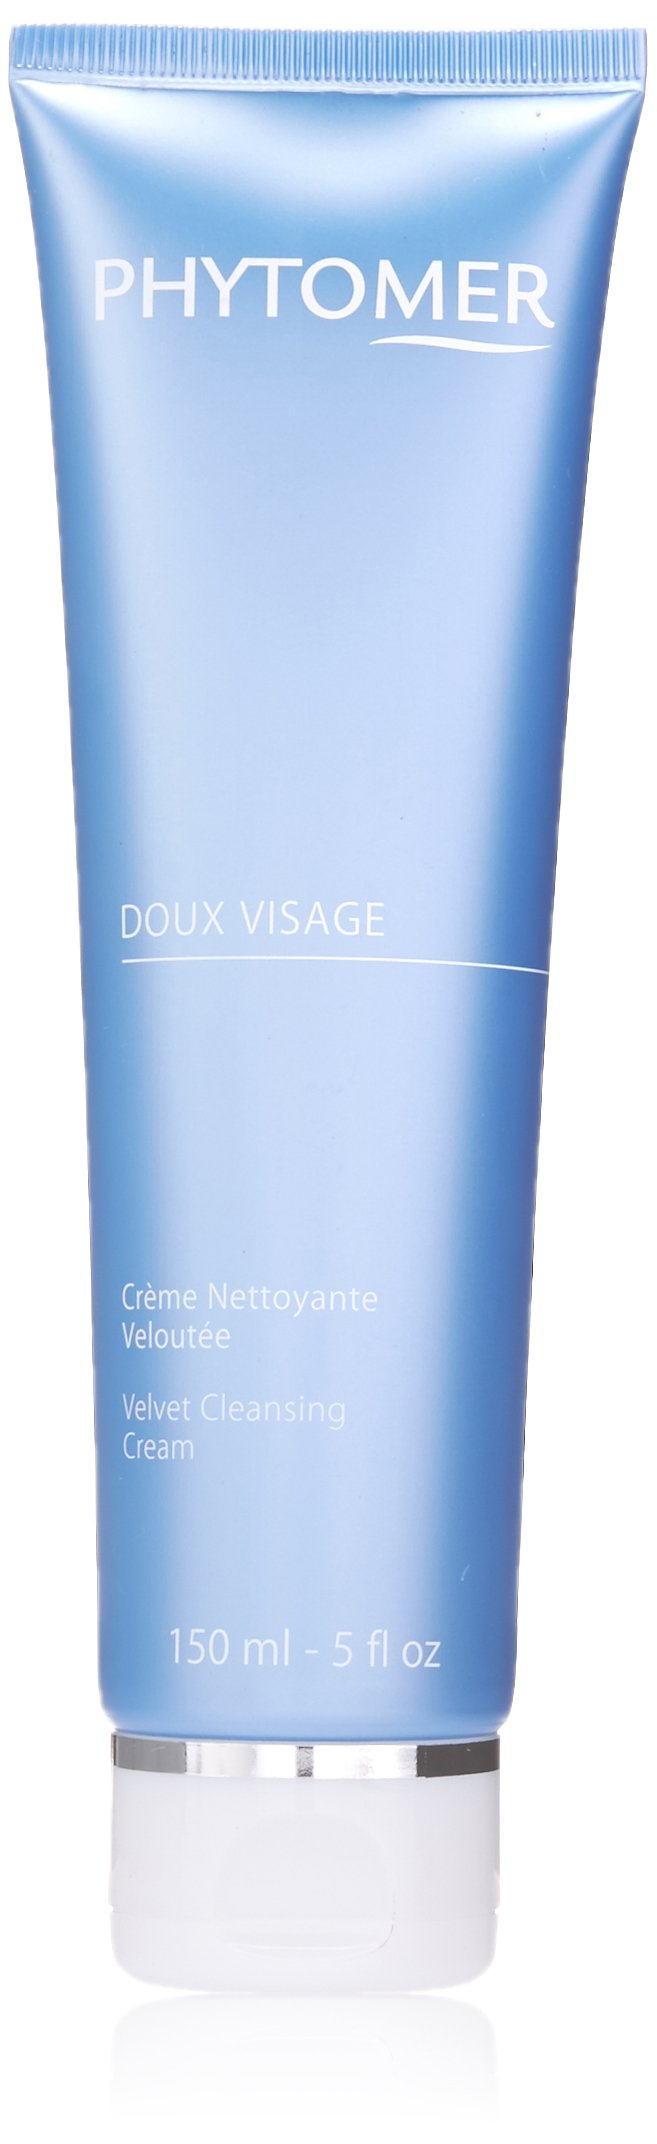 Phytomer Doux Visage Velvet Cleansing Cream, 5 Fluid Ounce